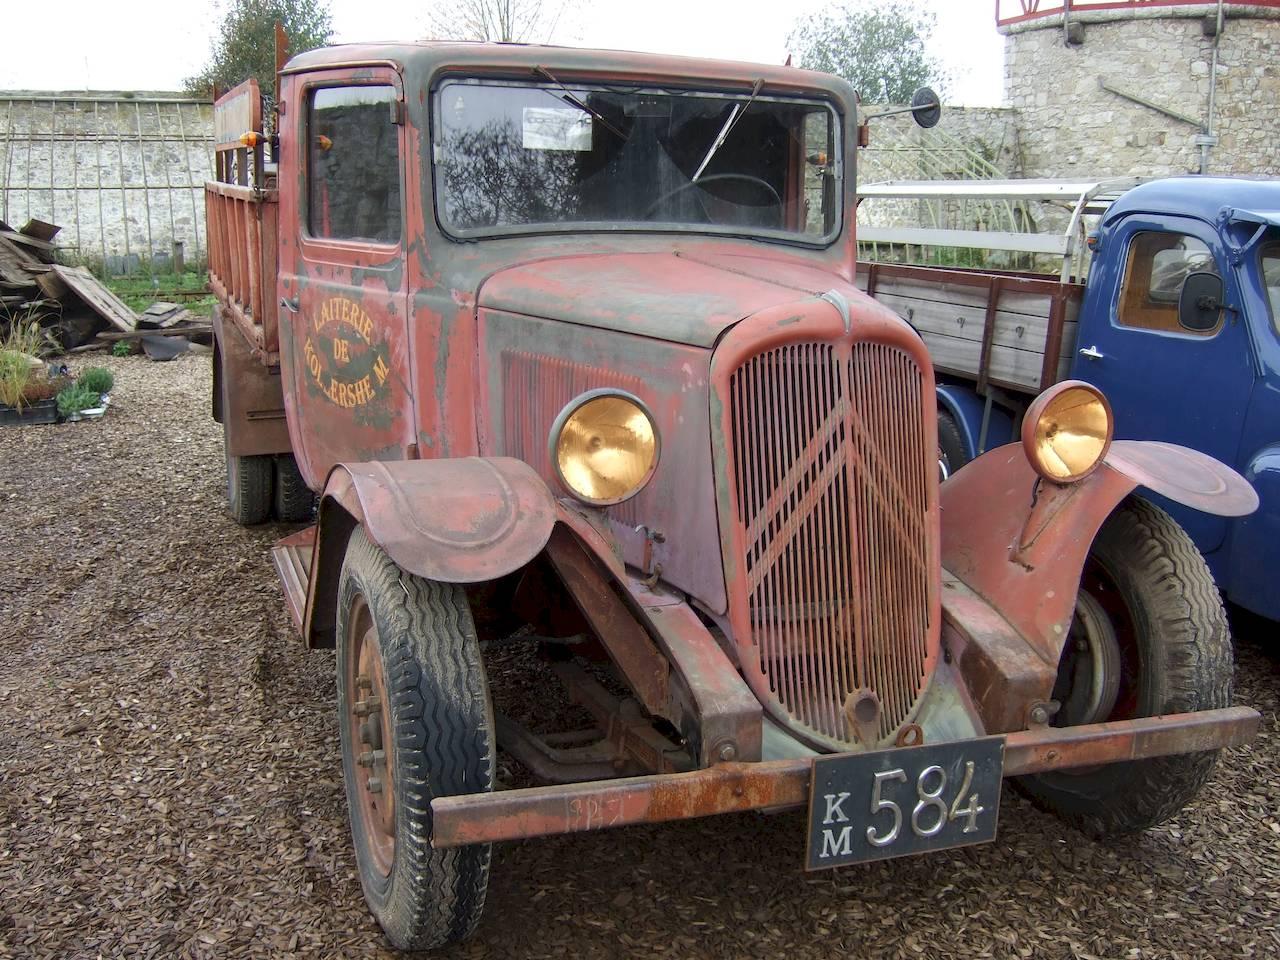 Truck old Citroen car